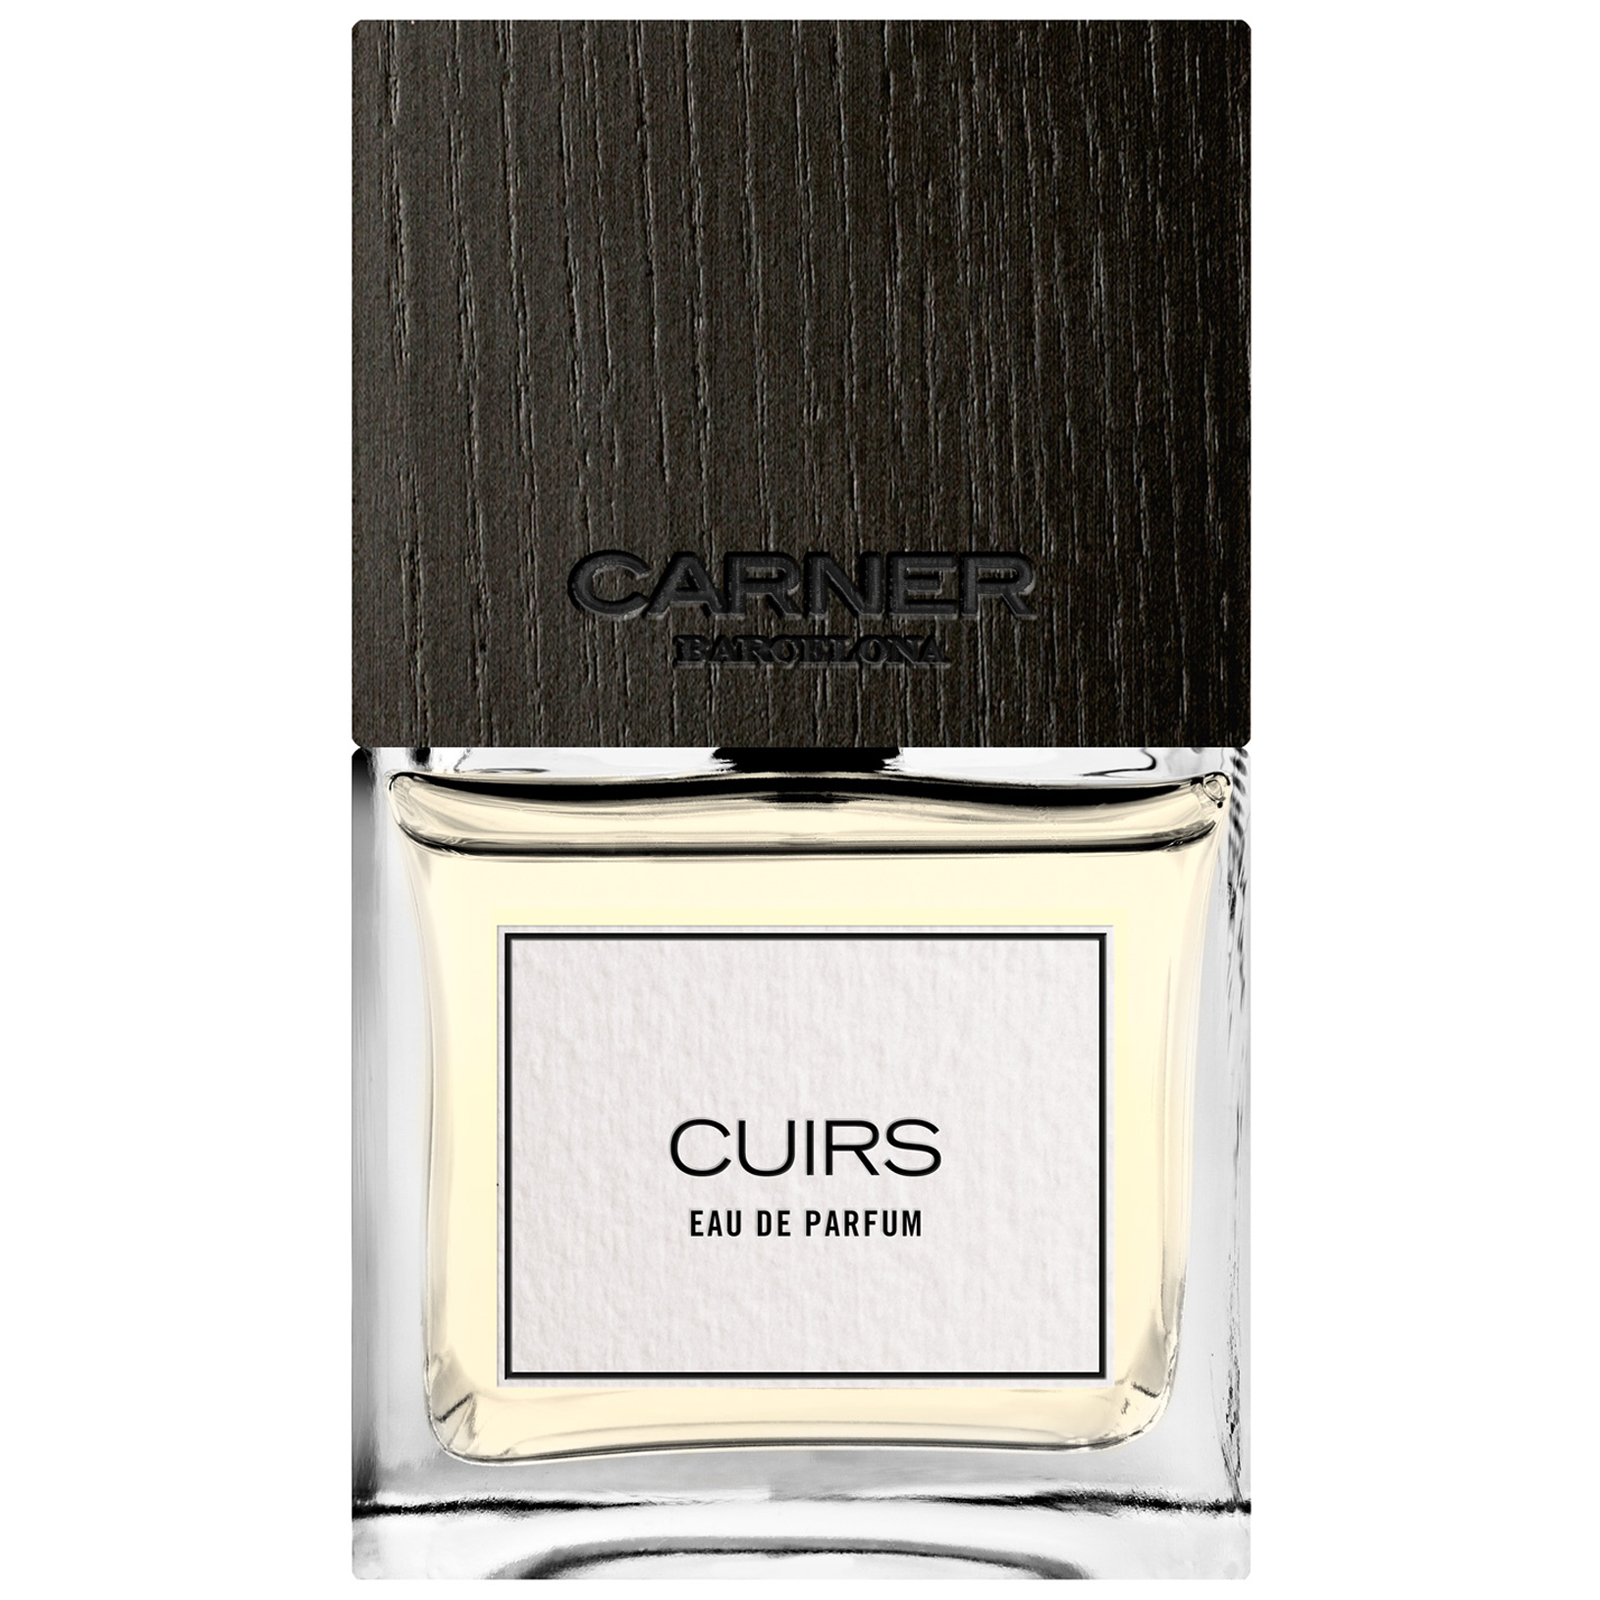 Cuirs profumo eau de parfum 100 ml